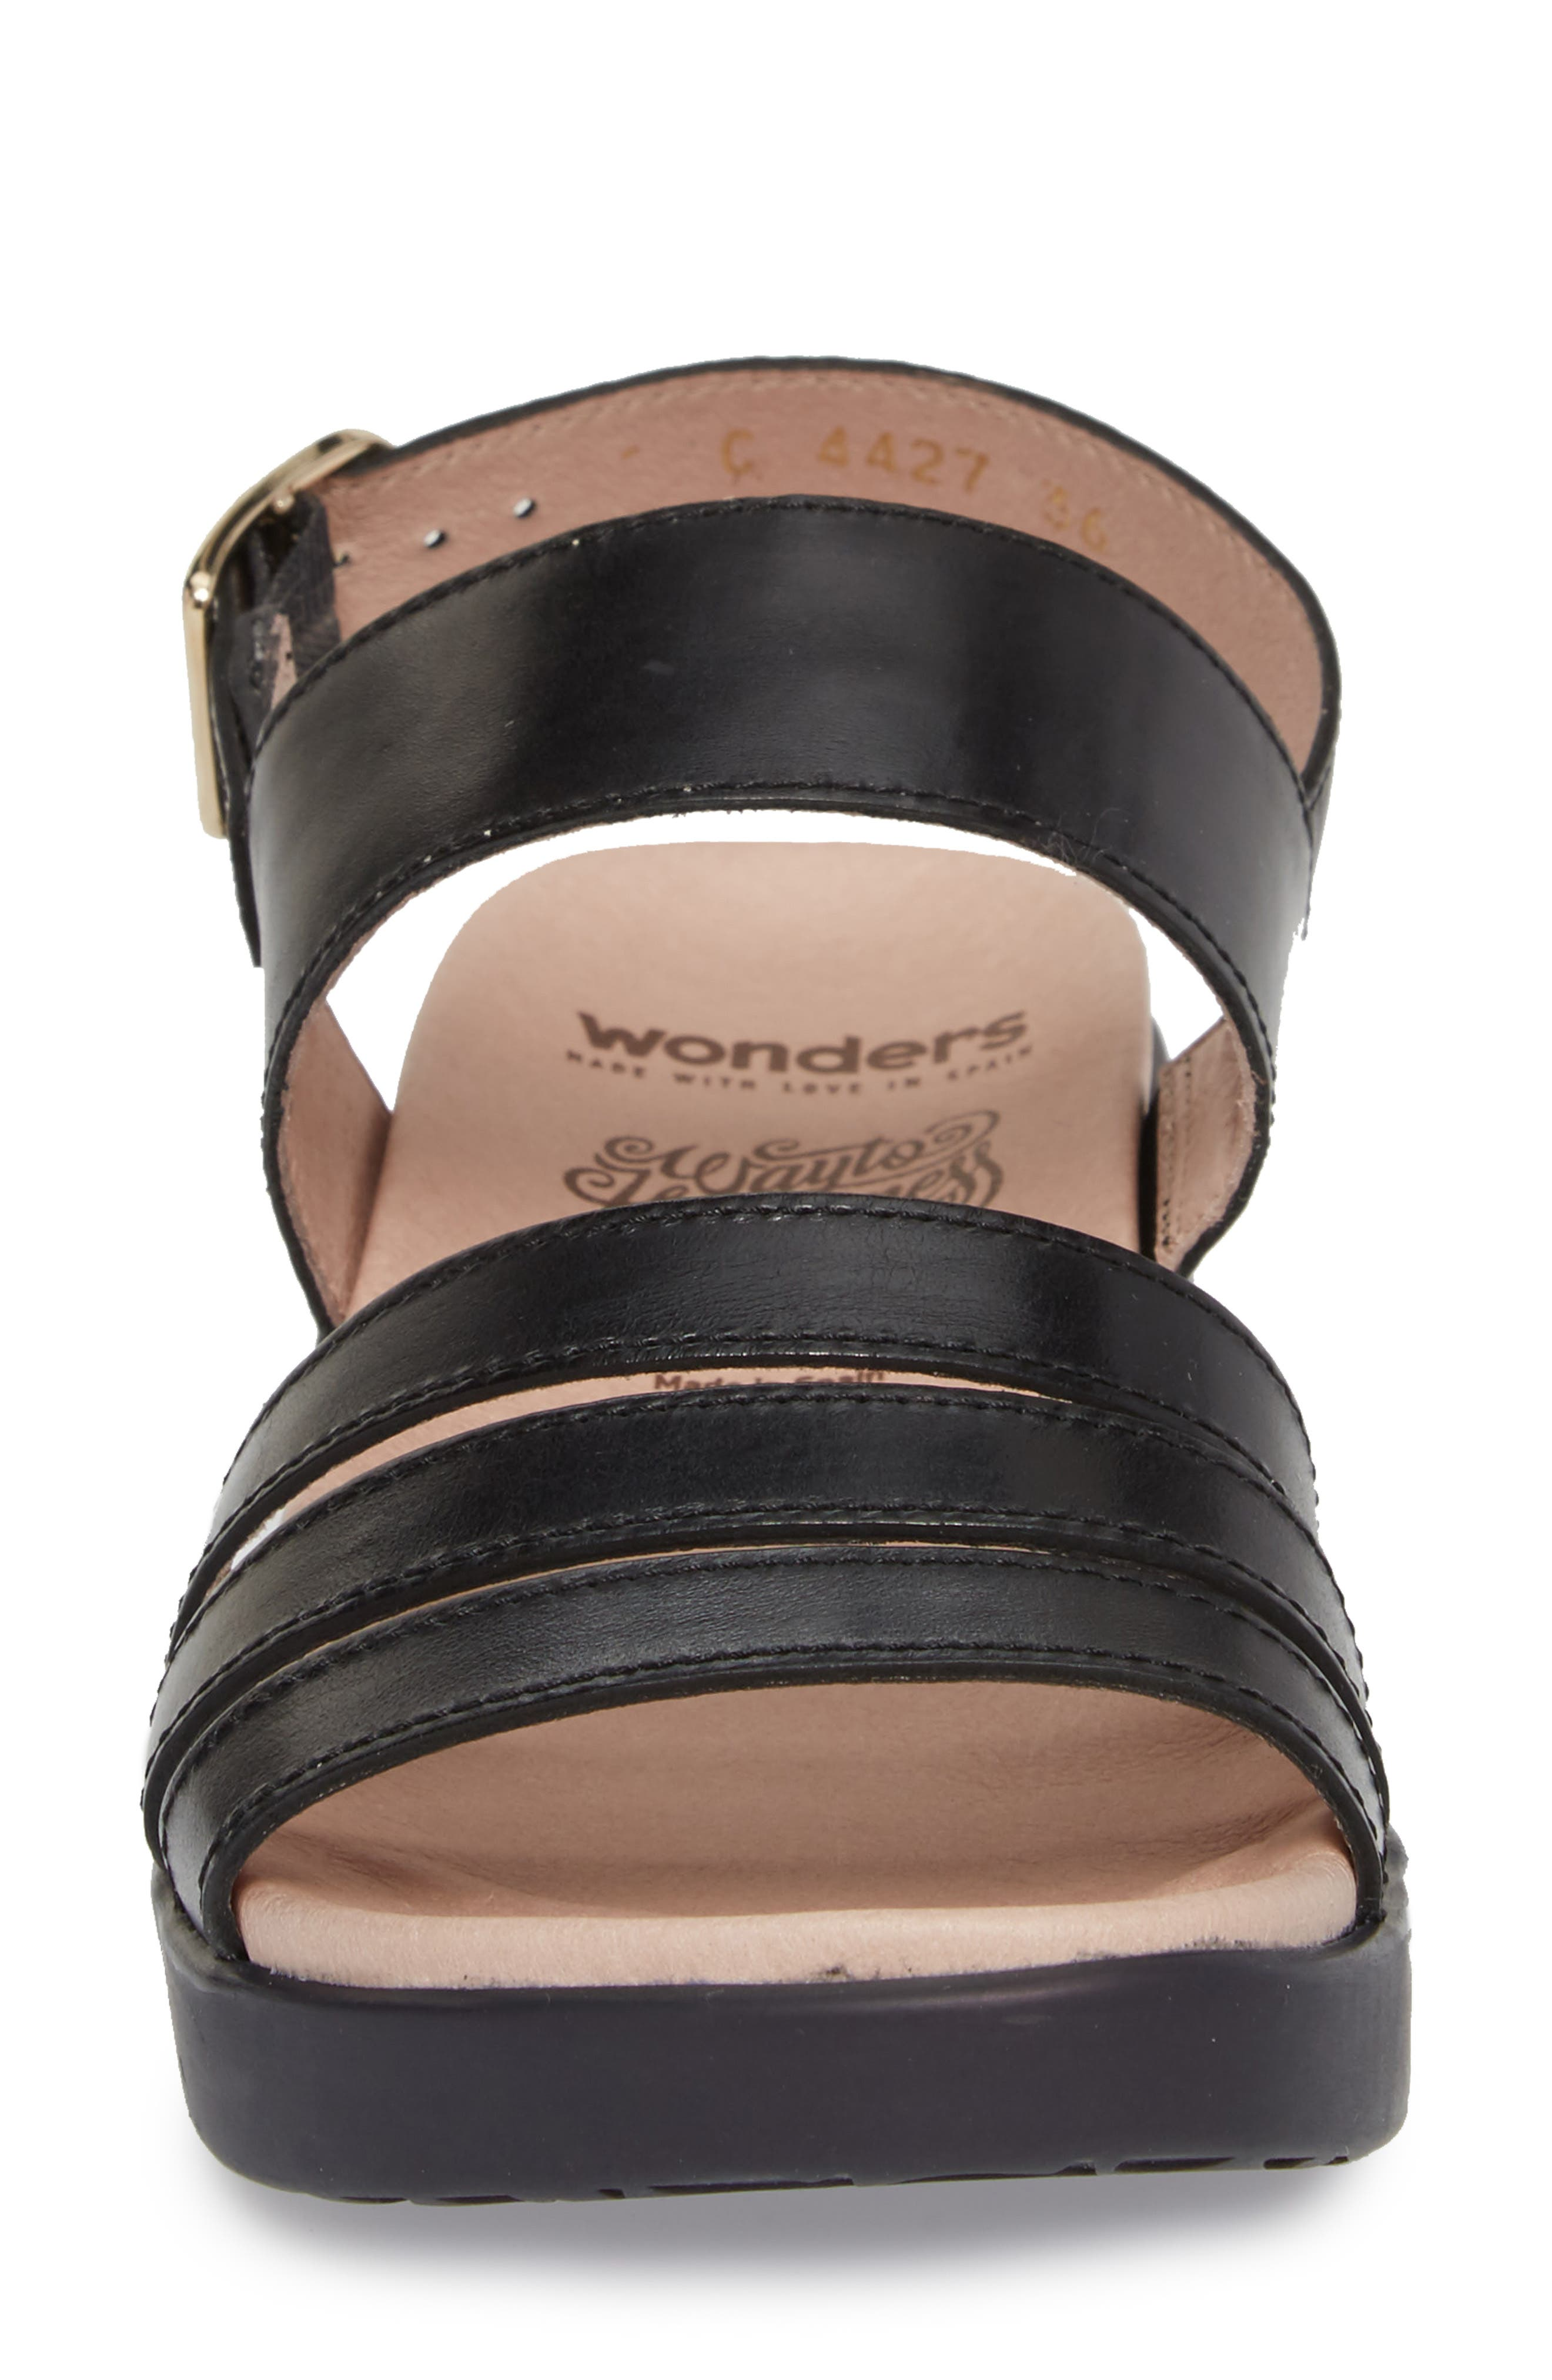 A-8004 Sandal,                             Alternate thumbnail 4, color,                             Black Leather